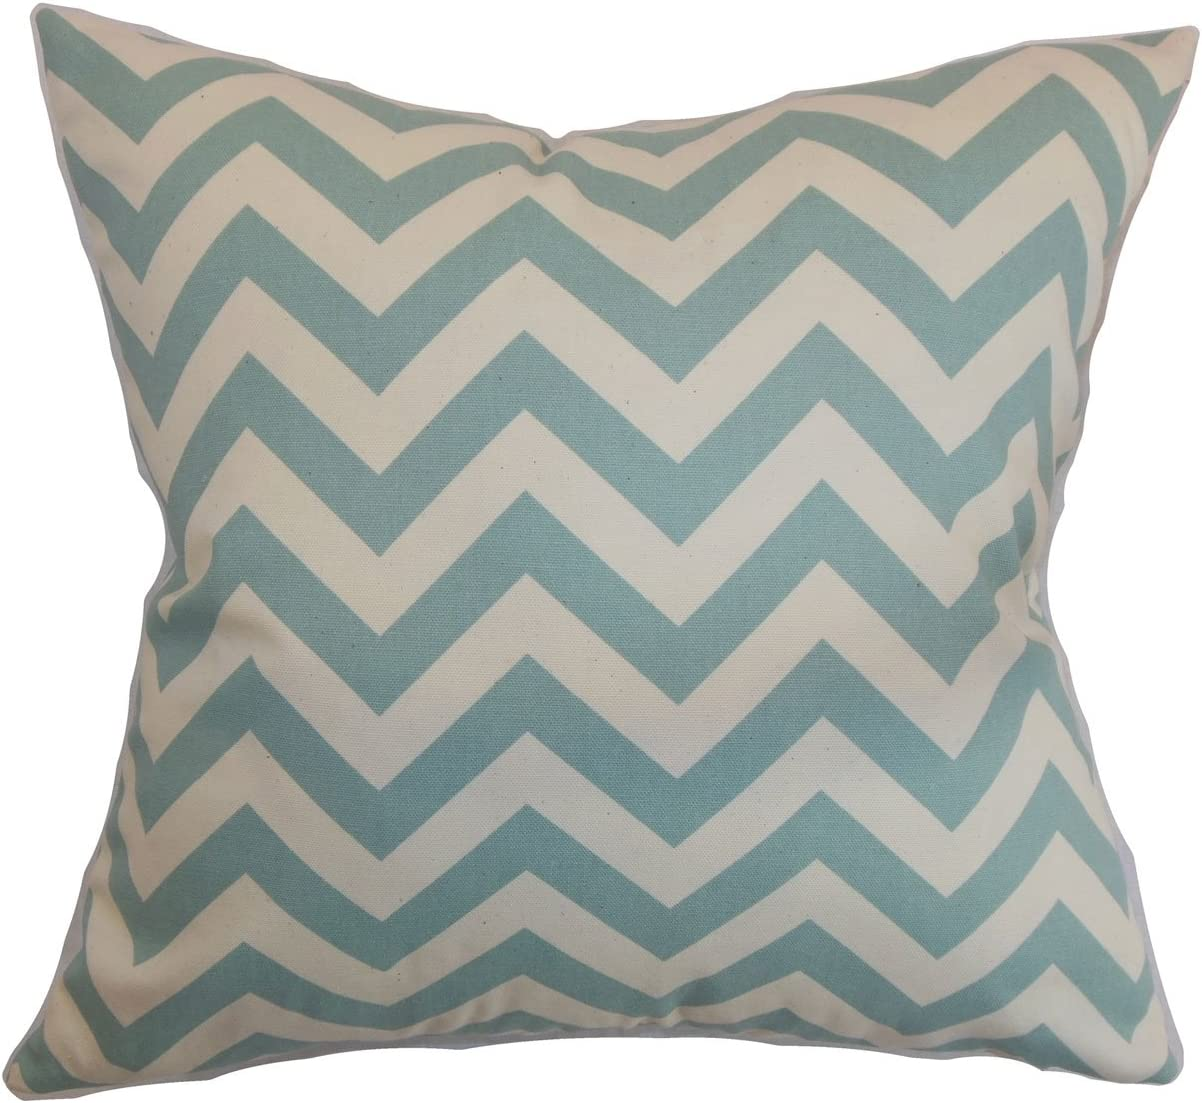 Amazon Com The Pillow Collection Xayabury Zigzag Pillow 18 X 18 Village Blue Natural Home Kitchen